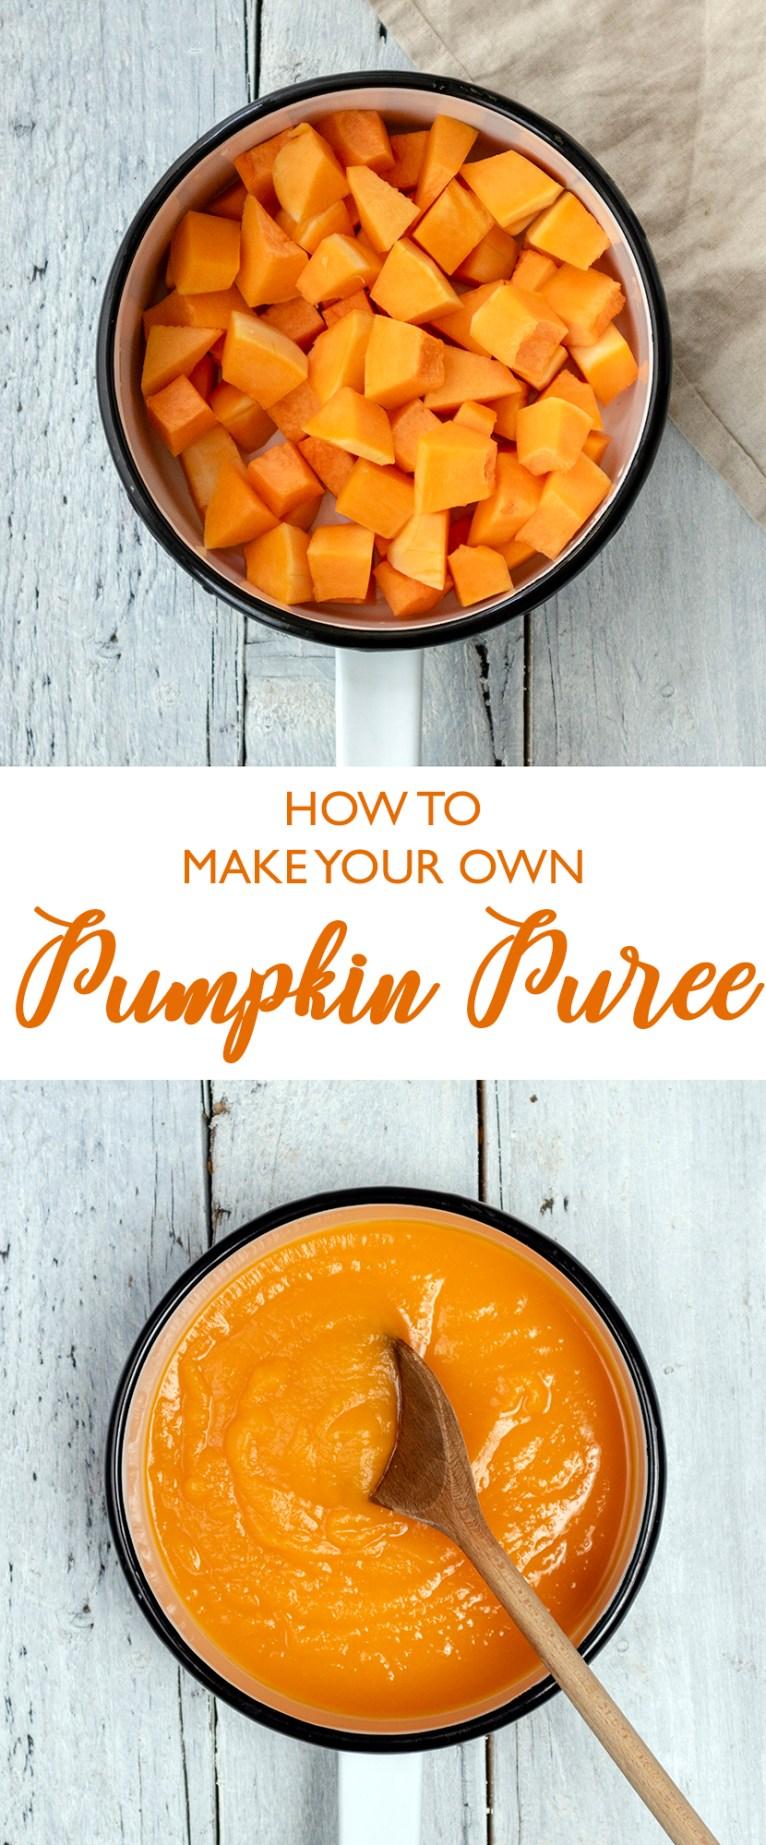 Homemade Pumpkin Puree Recipe (Vegan)